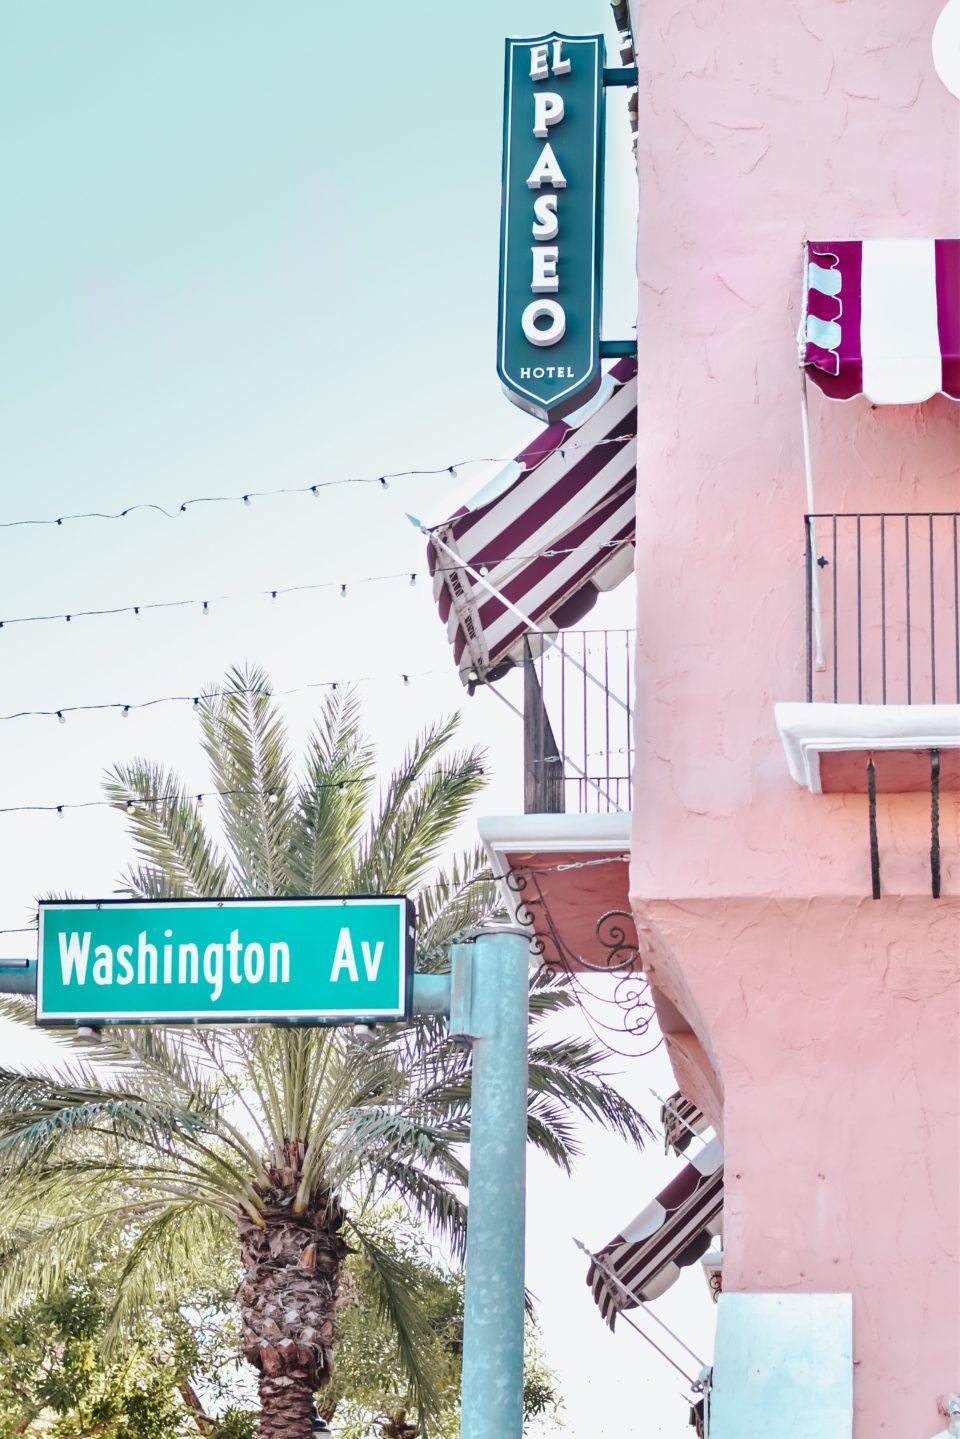 Miami Swim Week El Paseo Hotel South Beach - 30A Mama